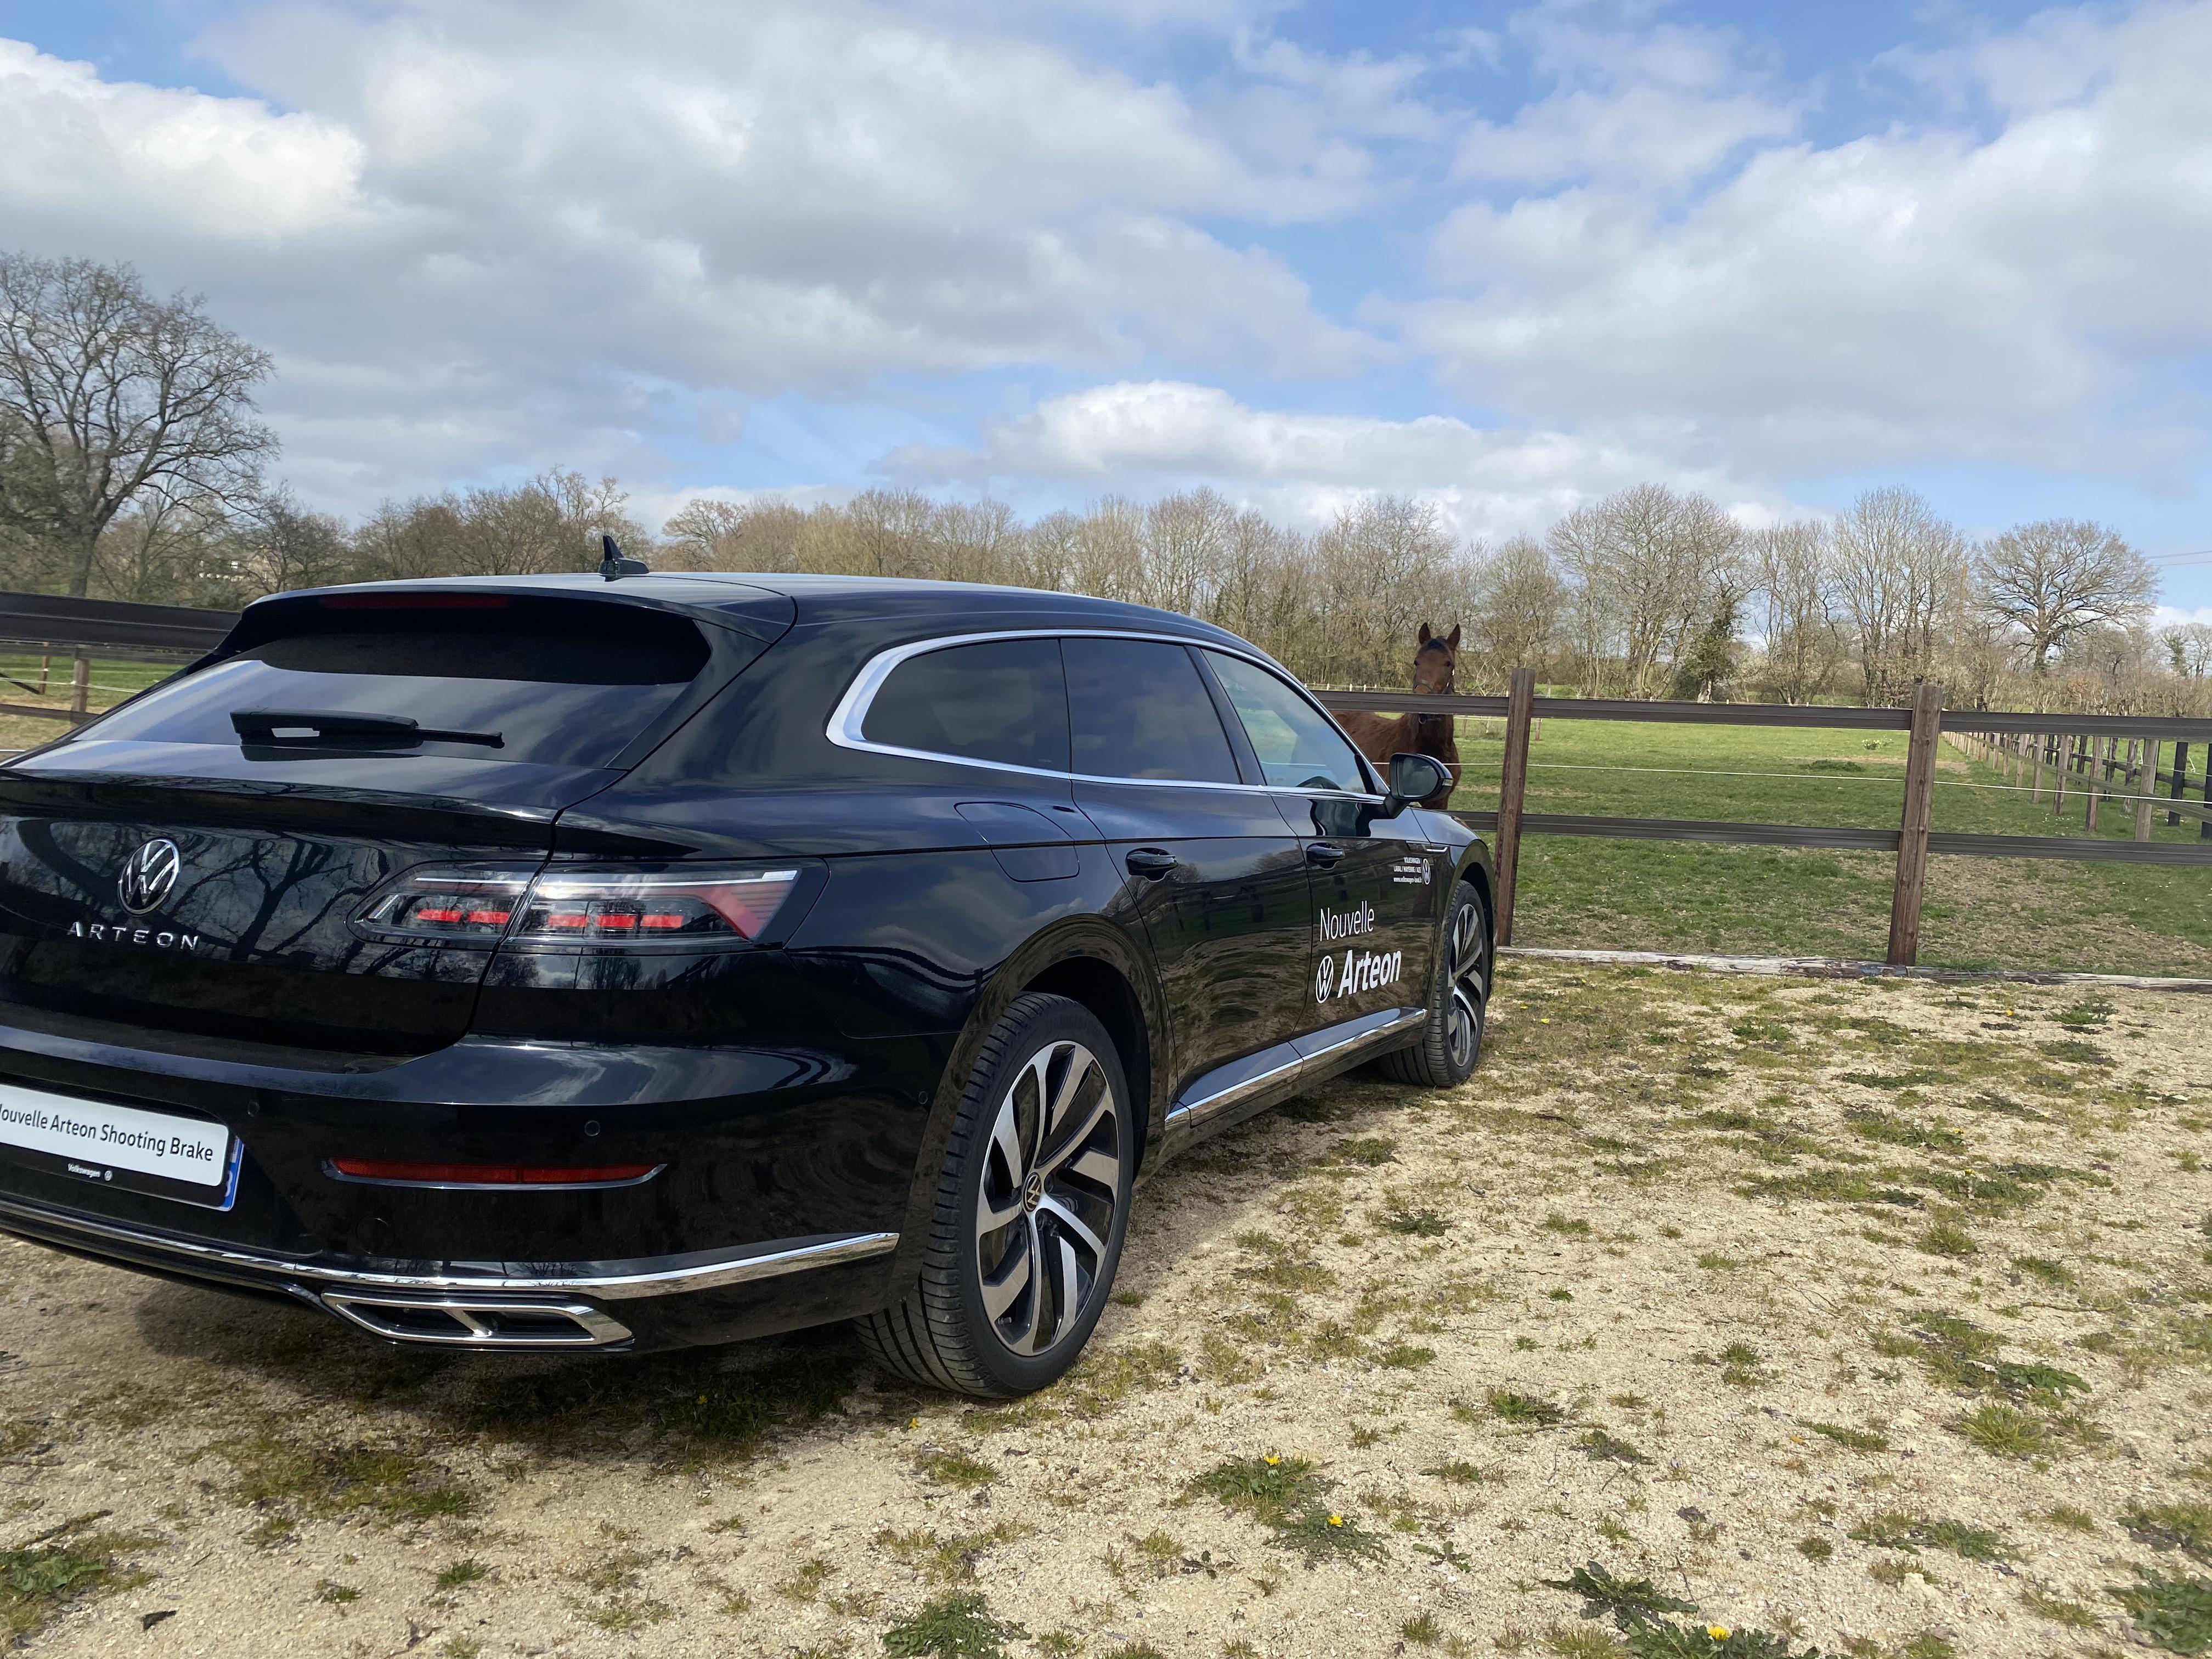 Offre Arteon Shooting Brake Volkswagen Laval